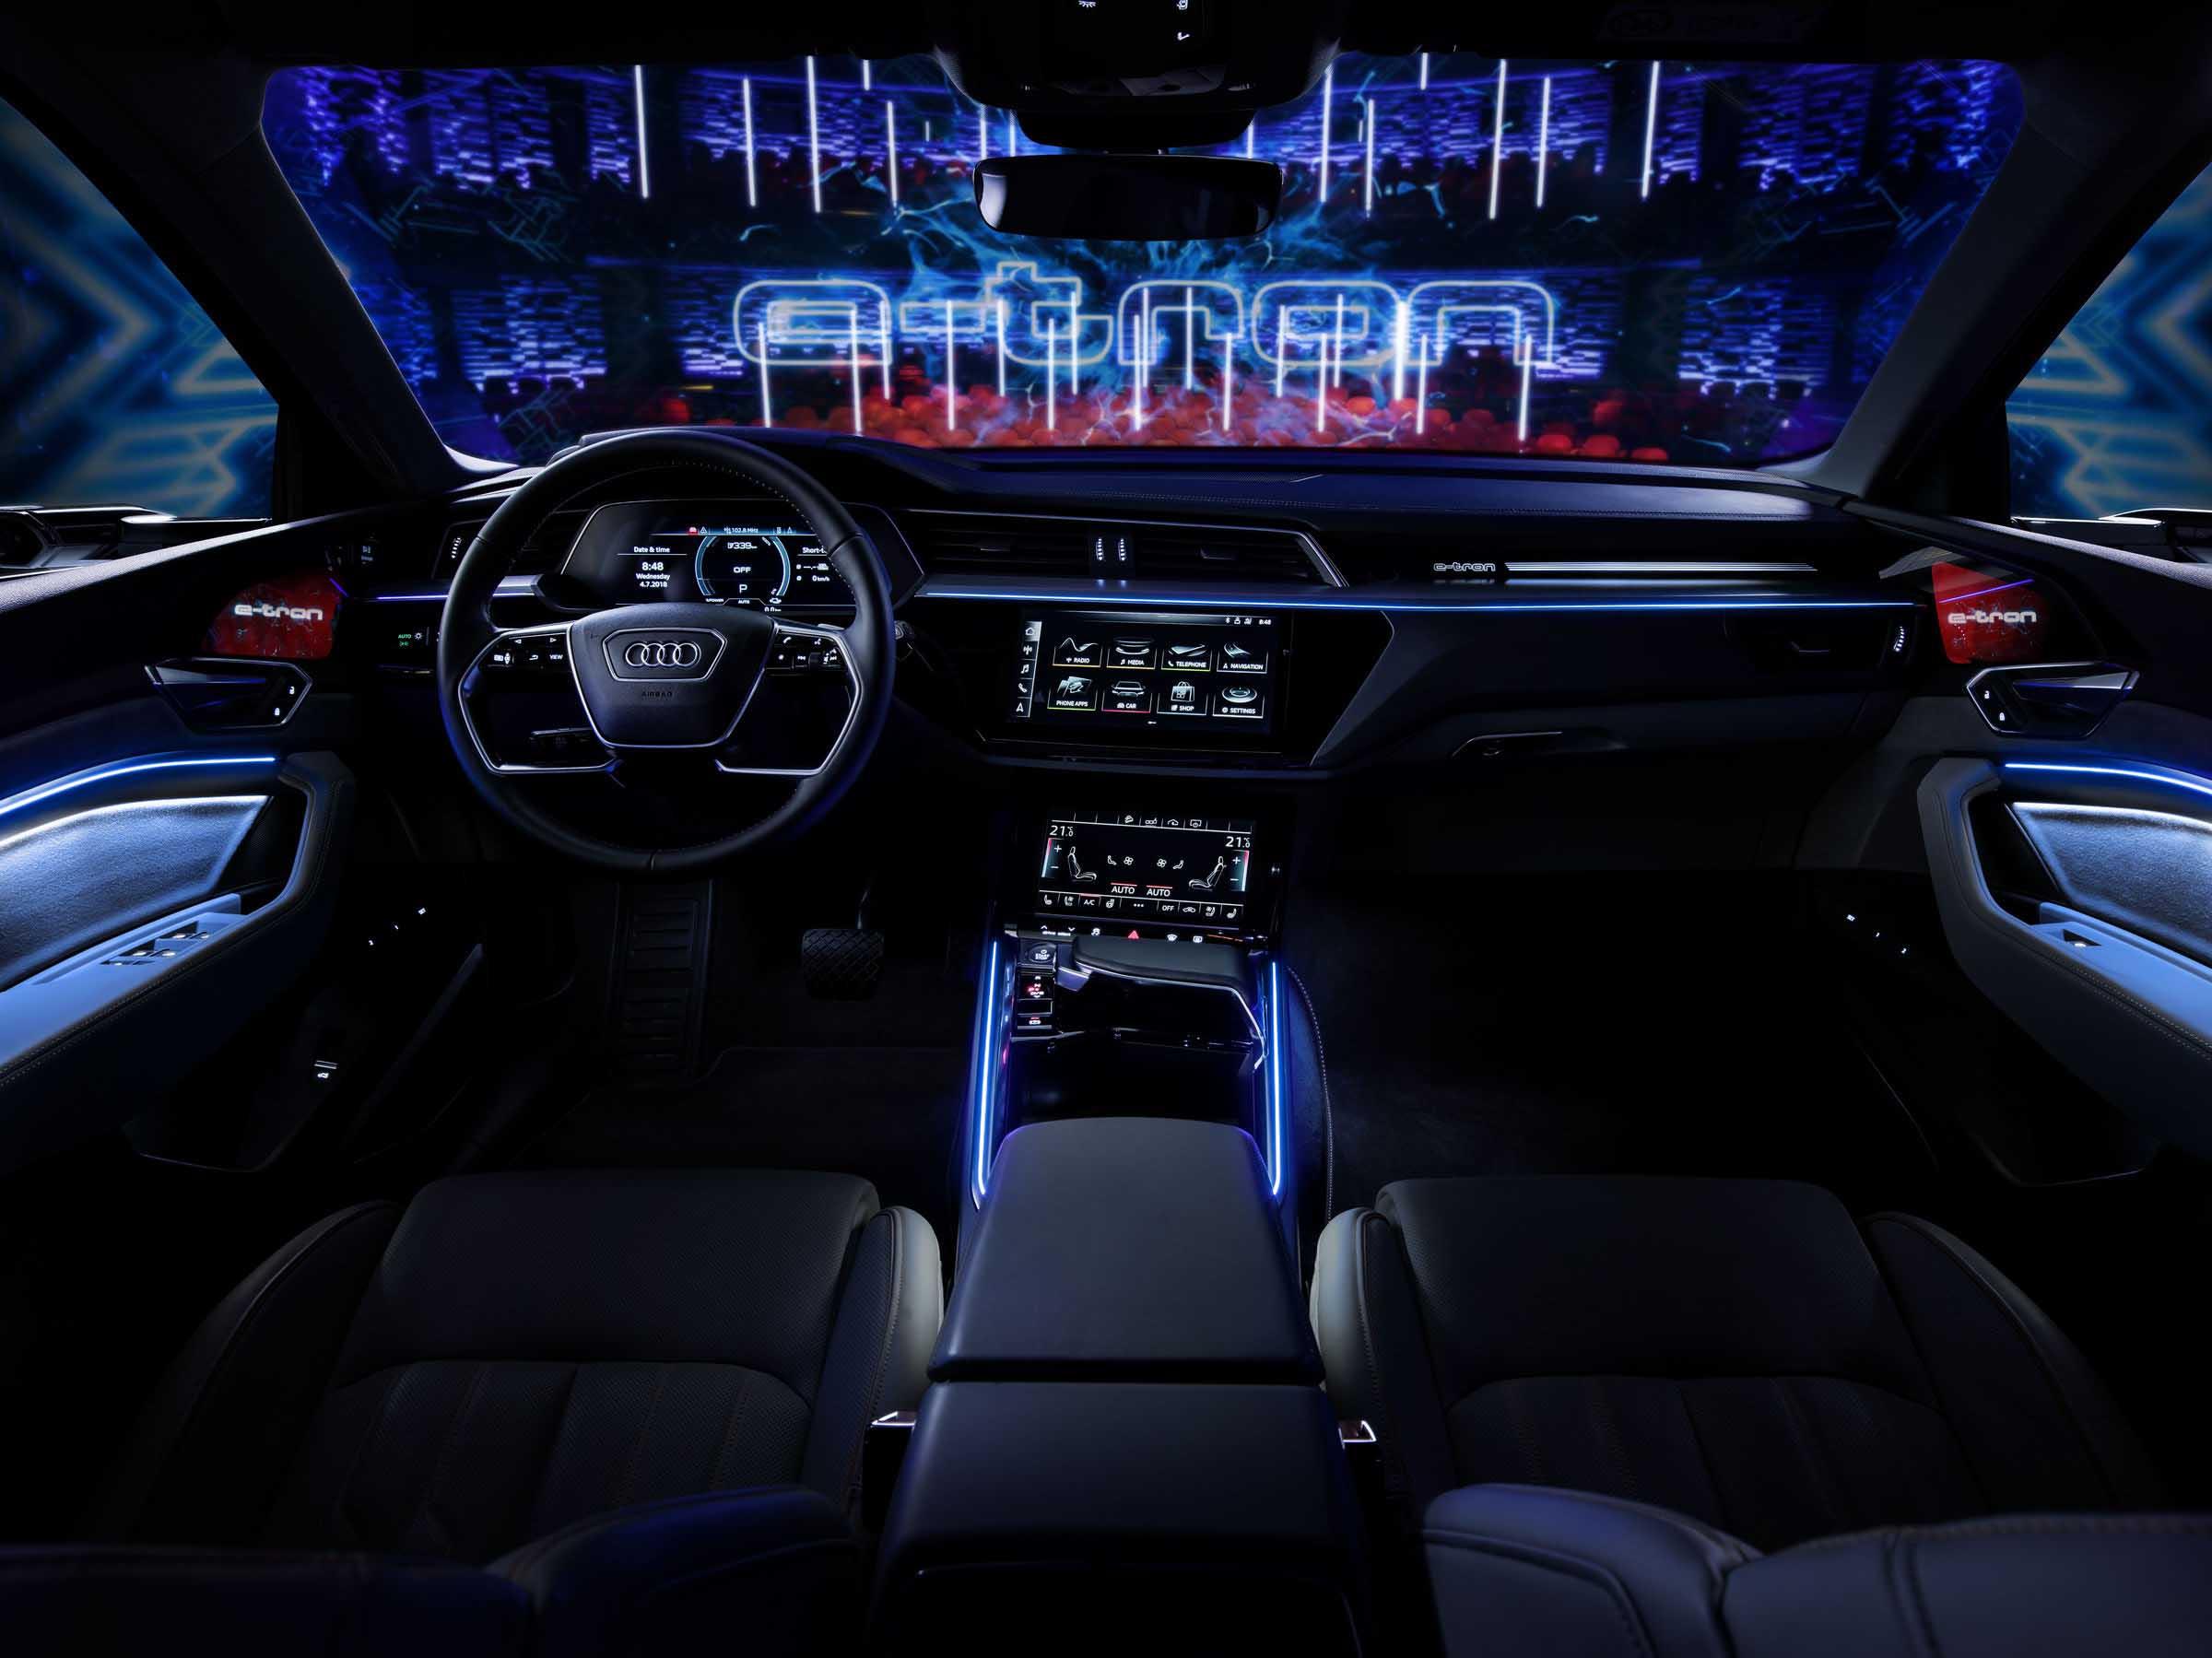 A187611 overfull - Erstes Audi Elektroauto: Audi e-tron feiert sonnige Supersause in Kopenhagen